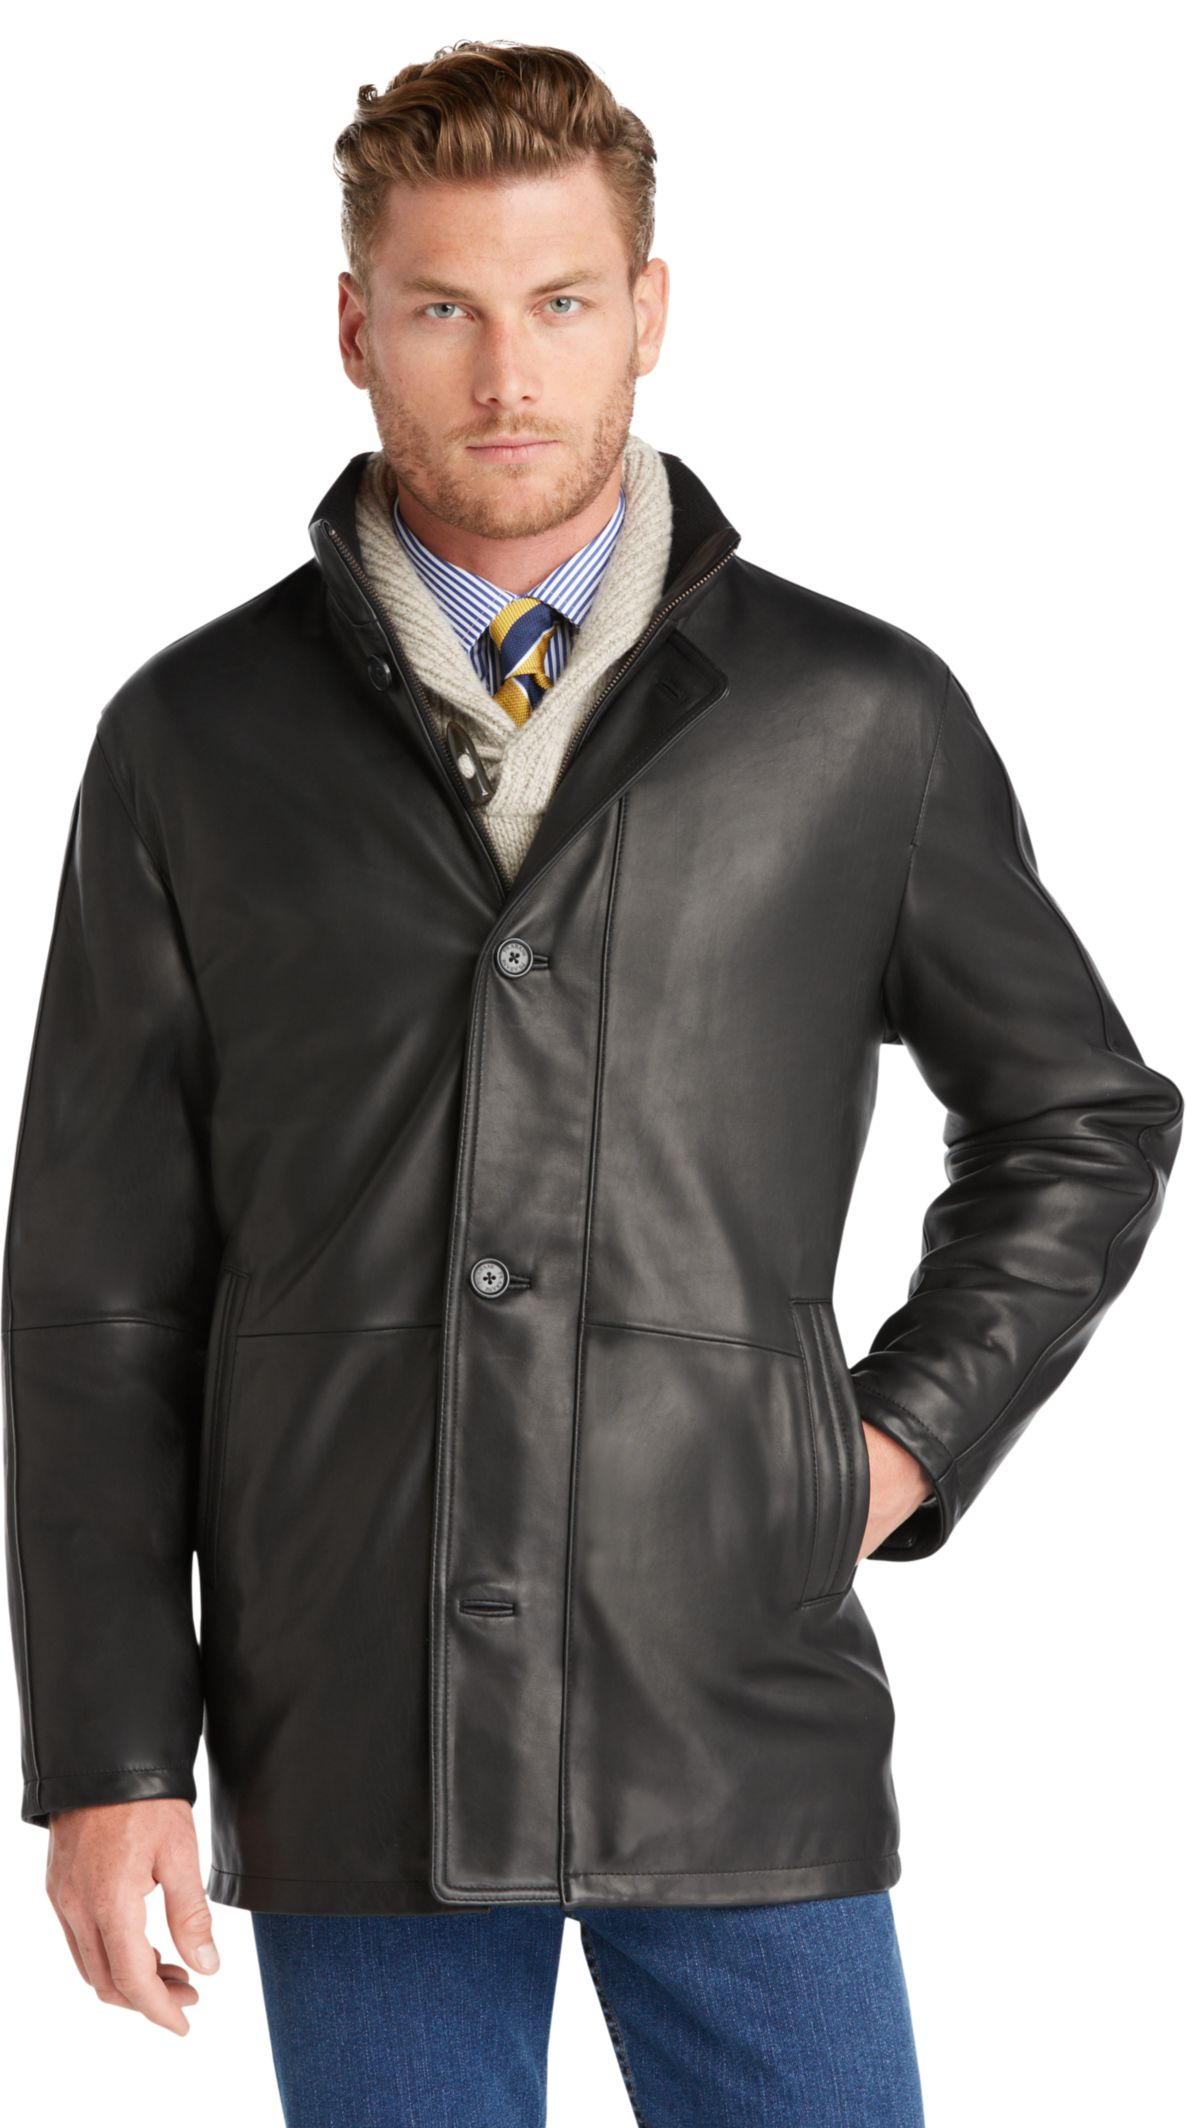 Men's Leather Jackets & Bomber Jackets | Men's Outerwear | JoS. A ...